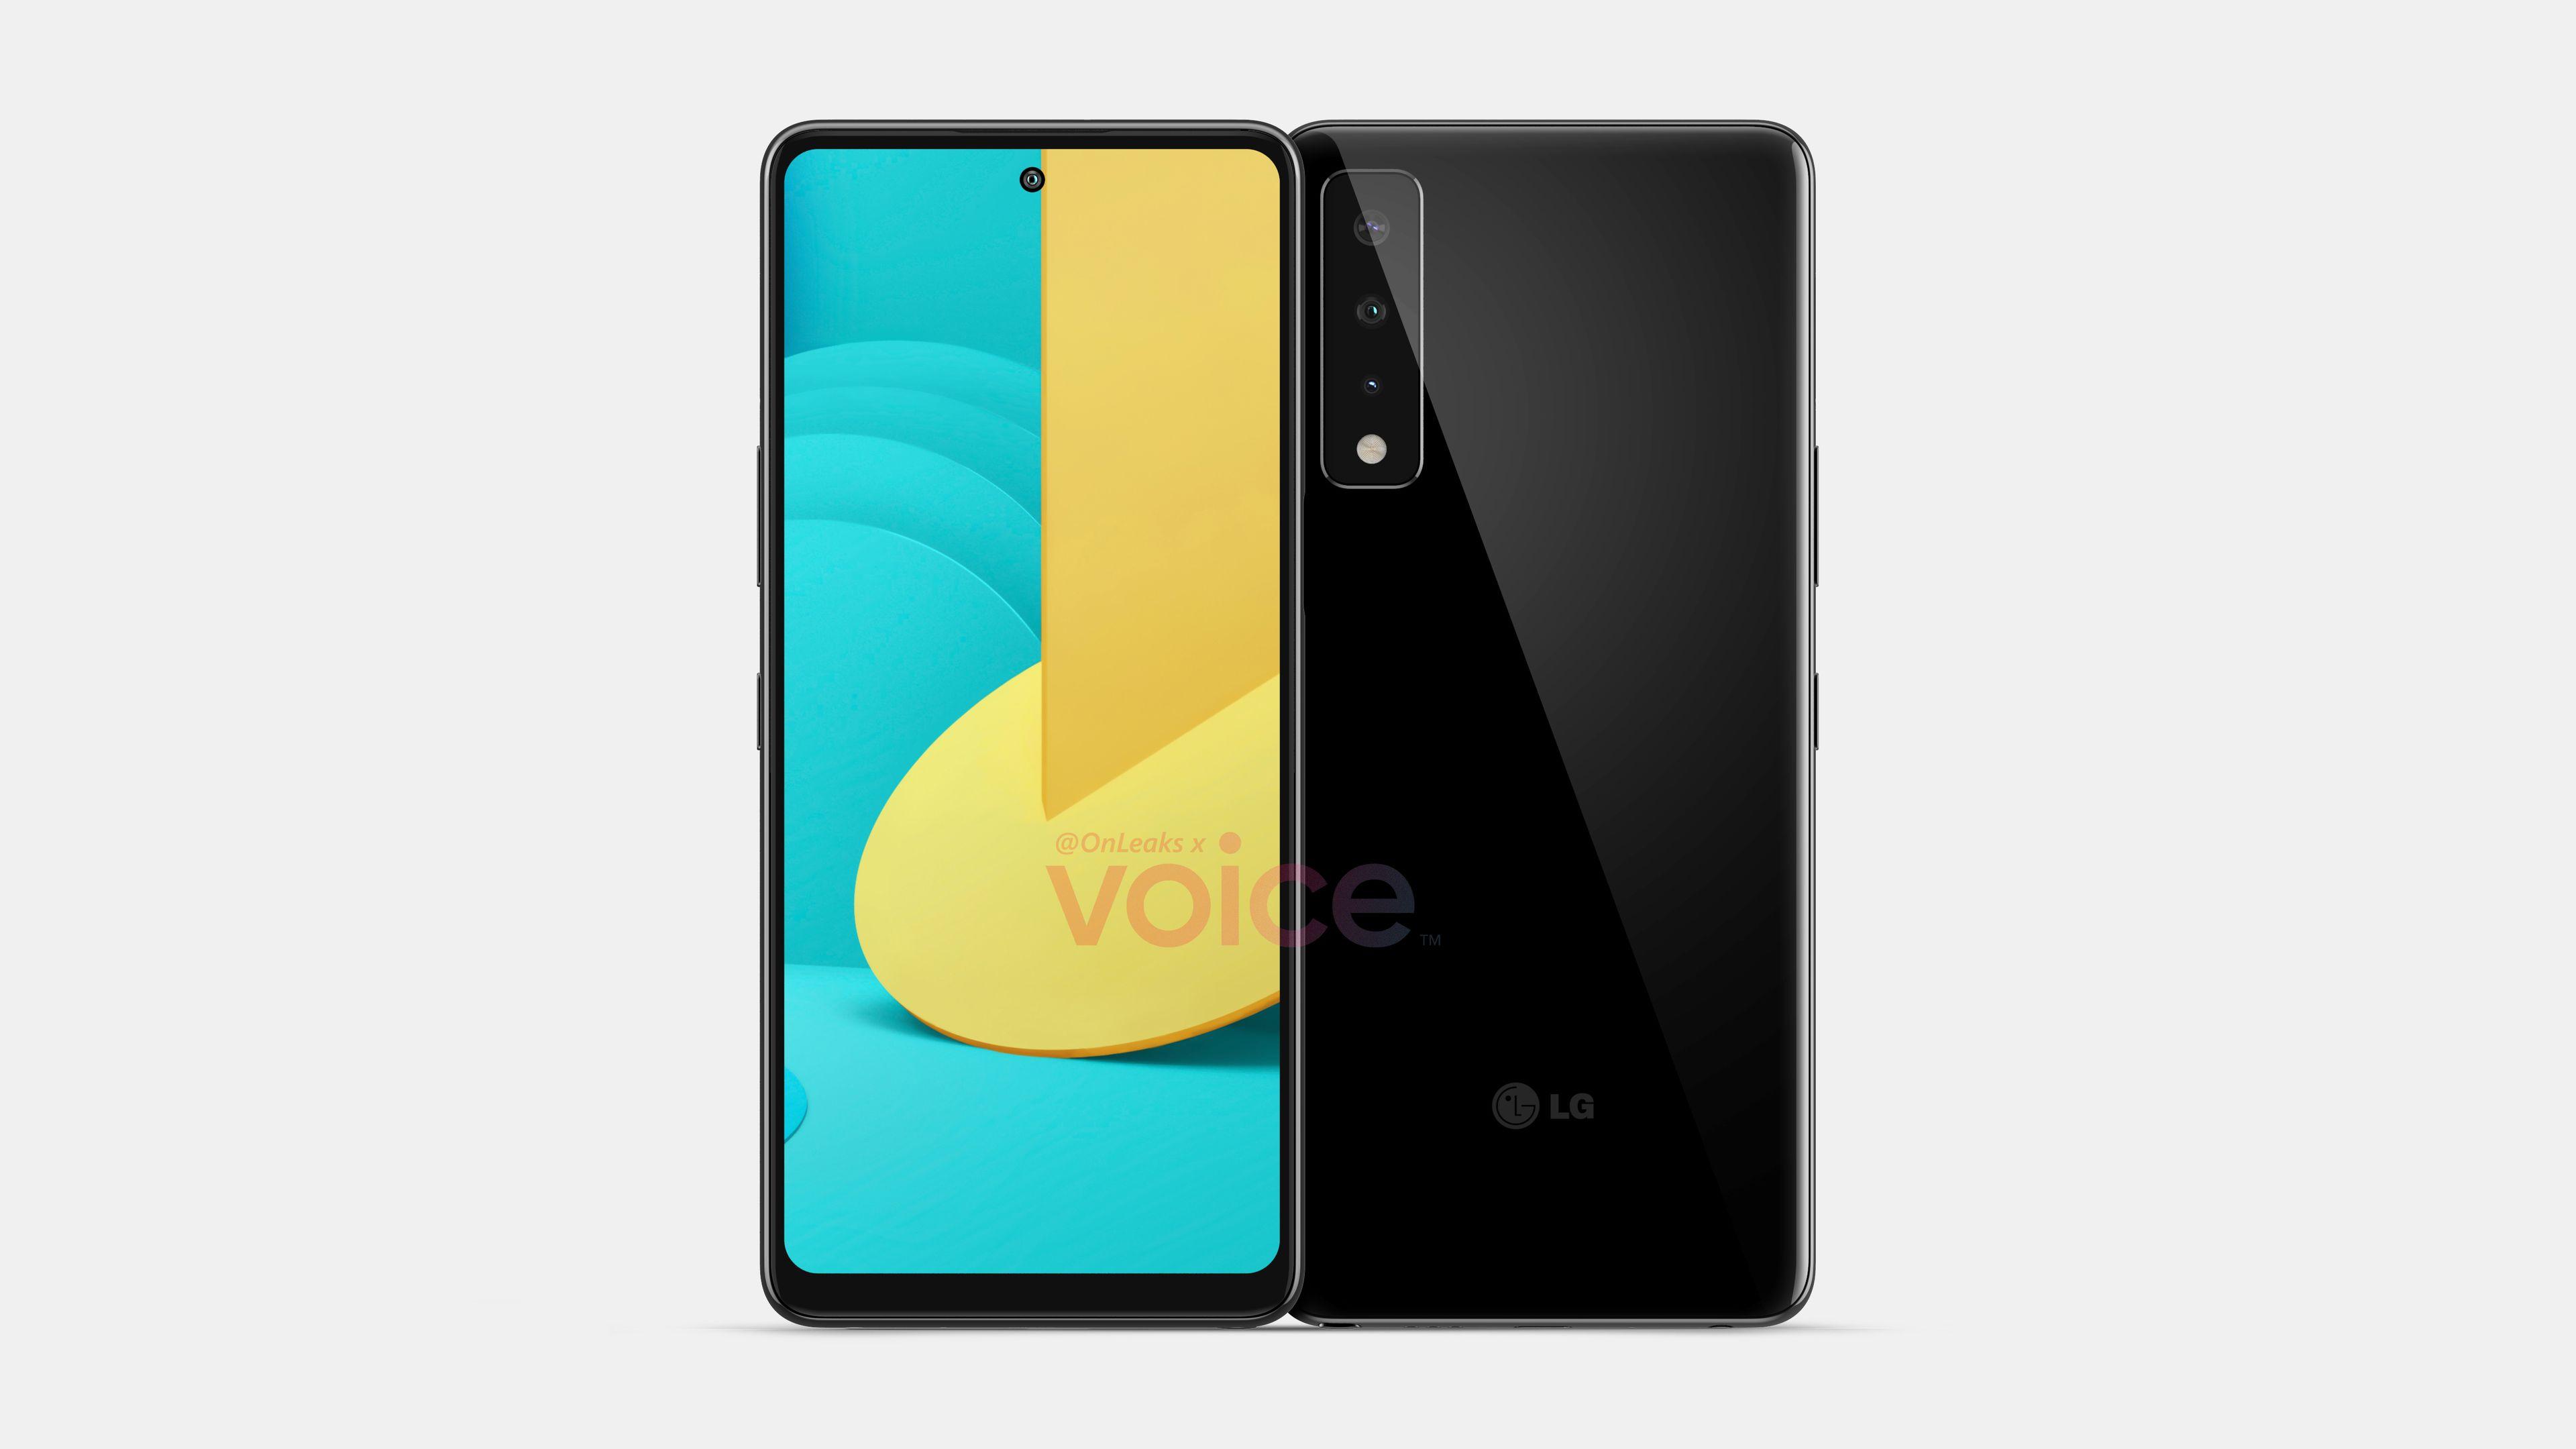 smartfon LG Stylo 7 5G smartphone